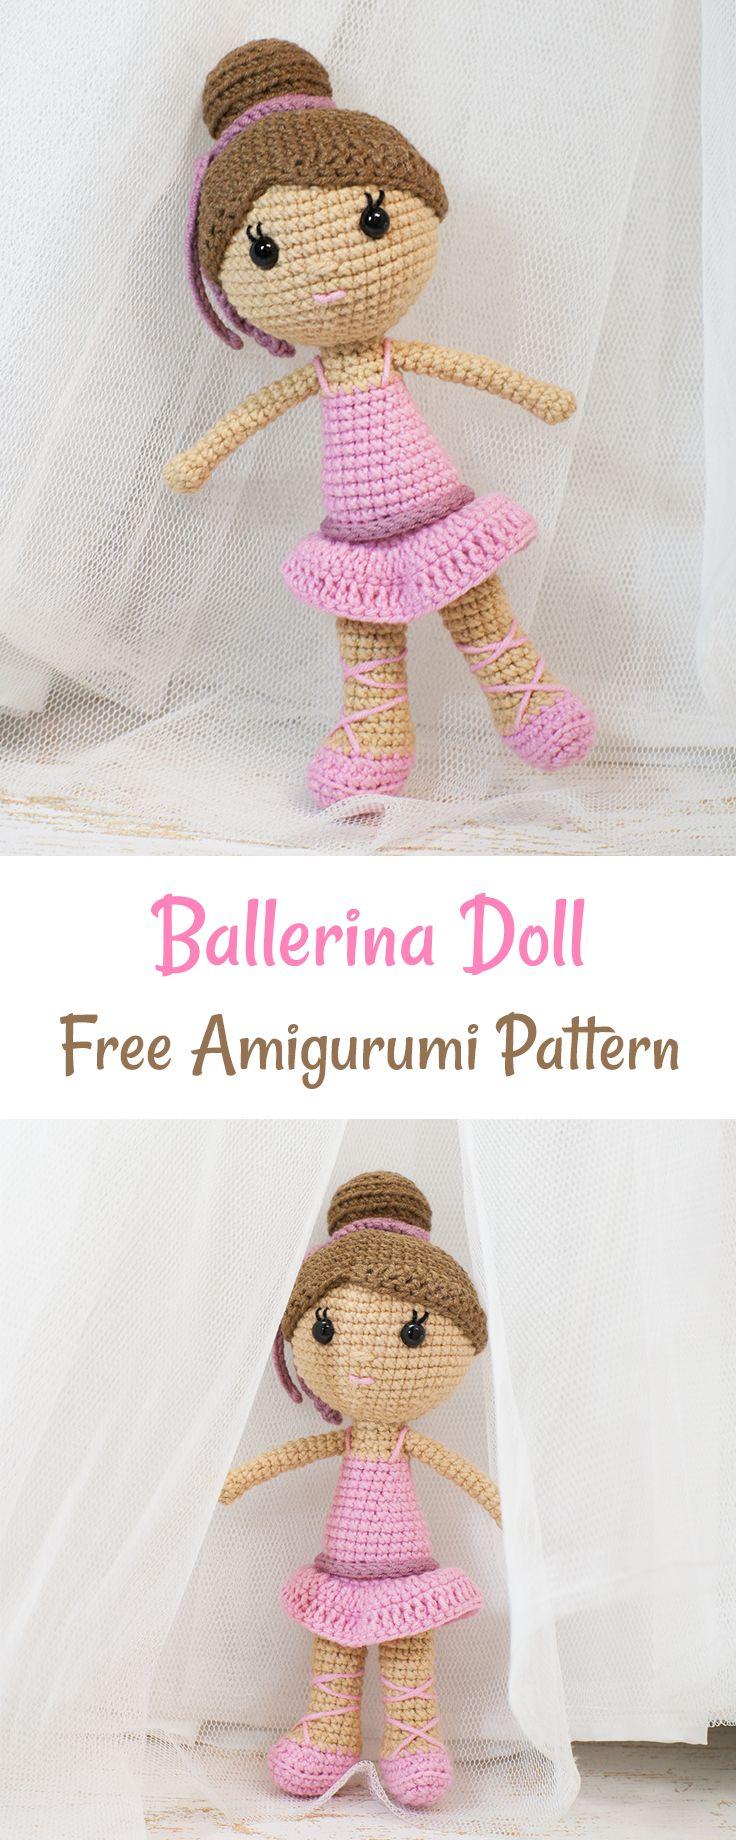 687 best Crochet images on Pinterest | Crochet patterns, Knit ...